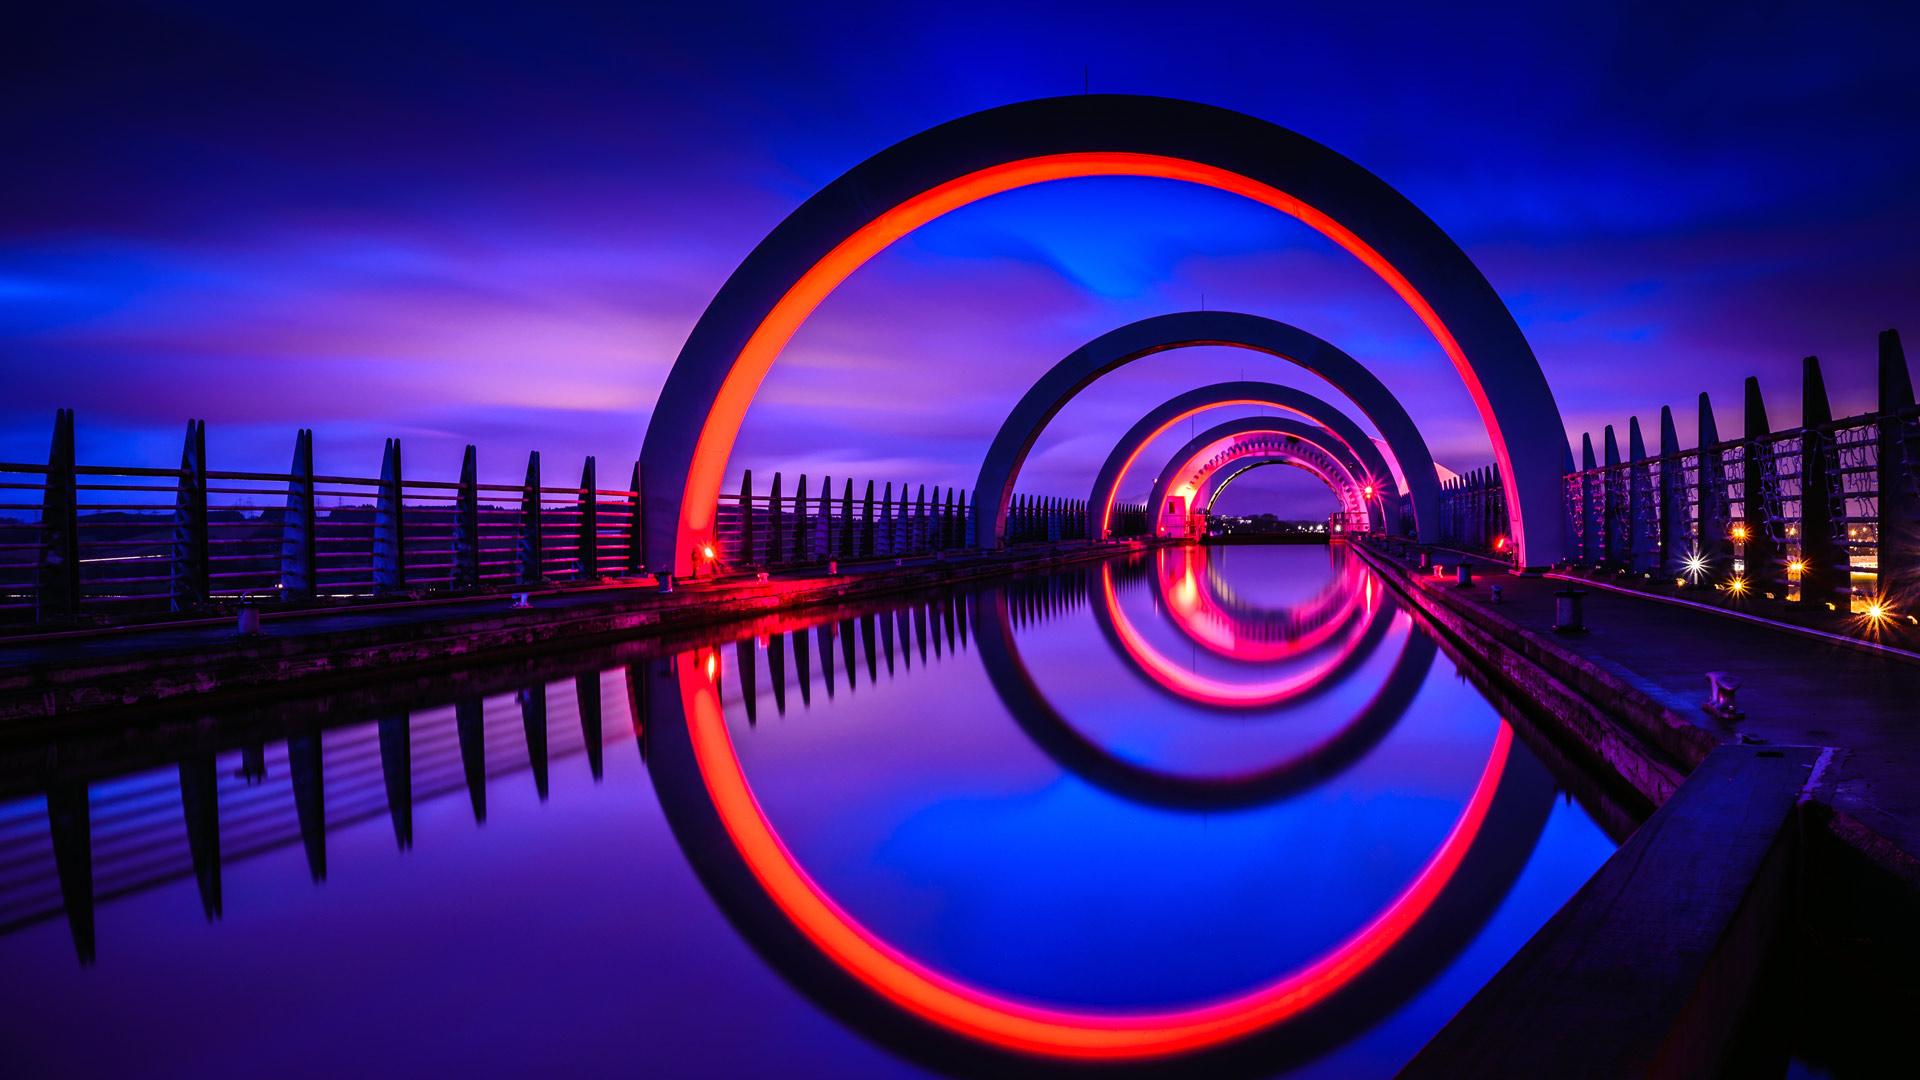 Scotland Falkirk Wheel